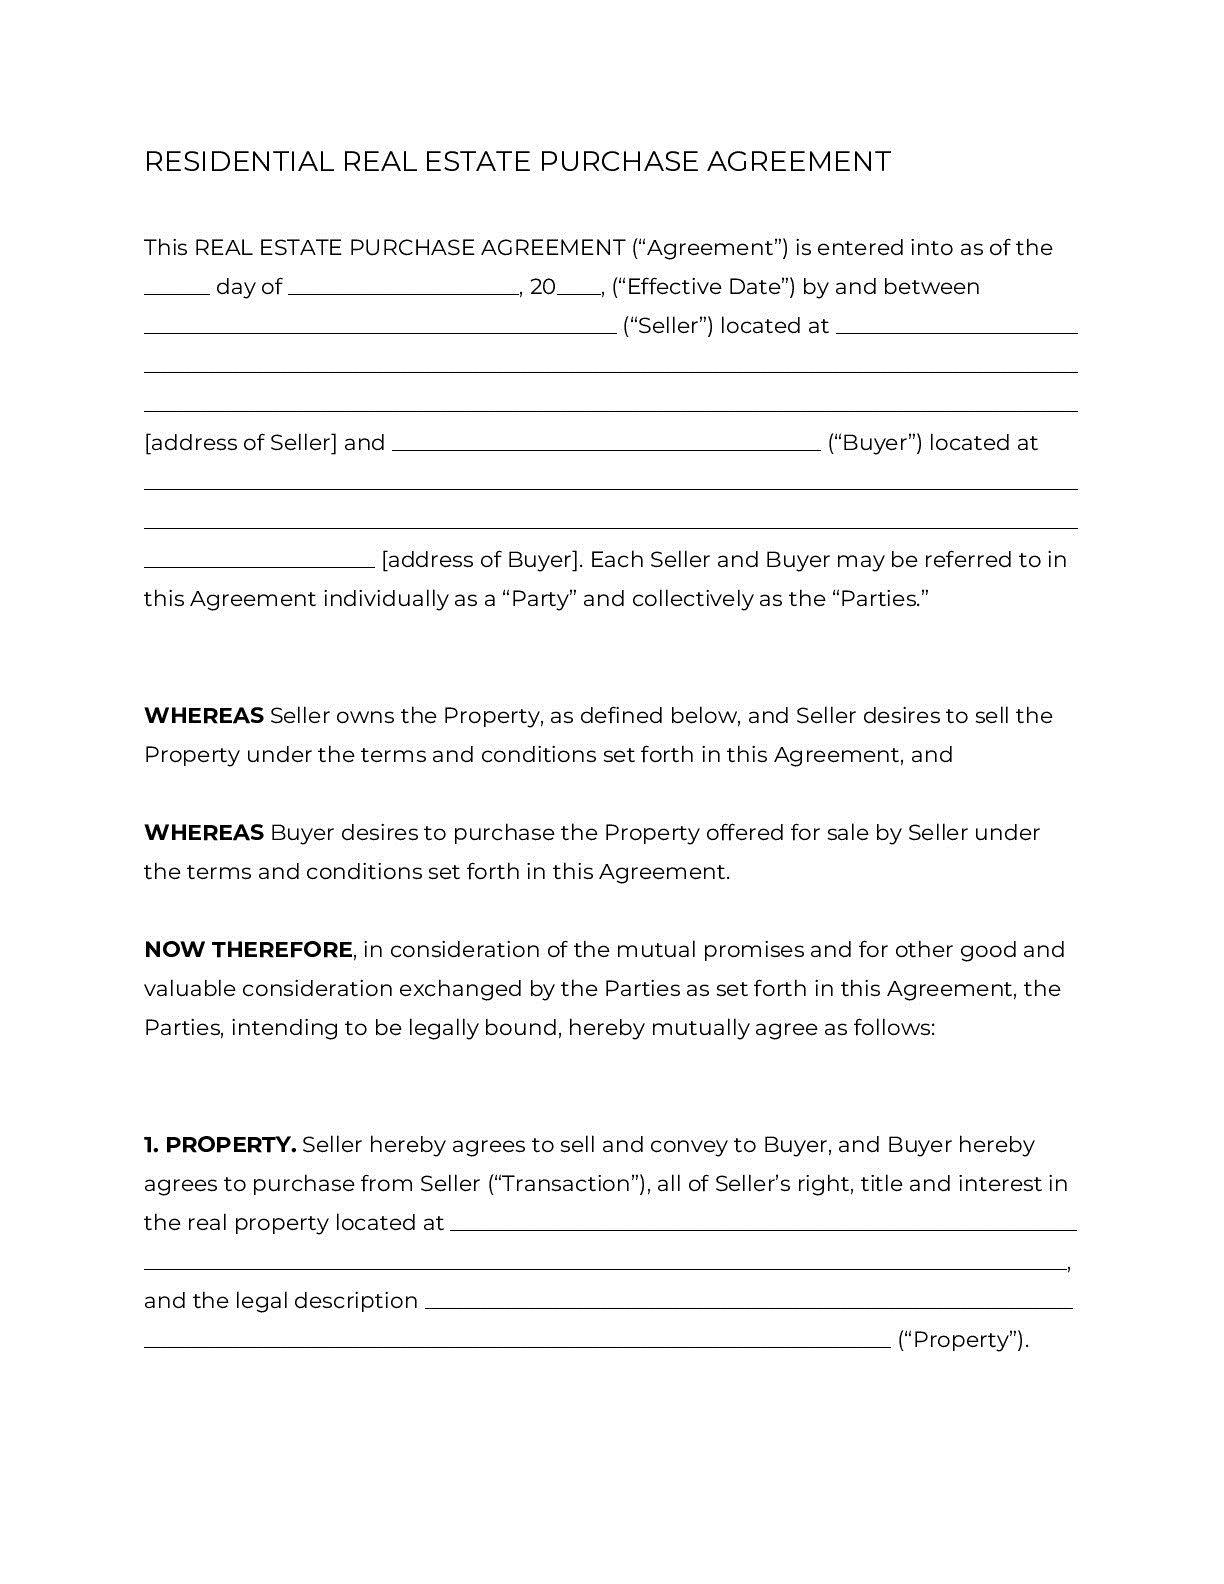 007 Singular Residential Purchase Agreement Template Highest Clarity  California Form FreeFull